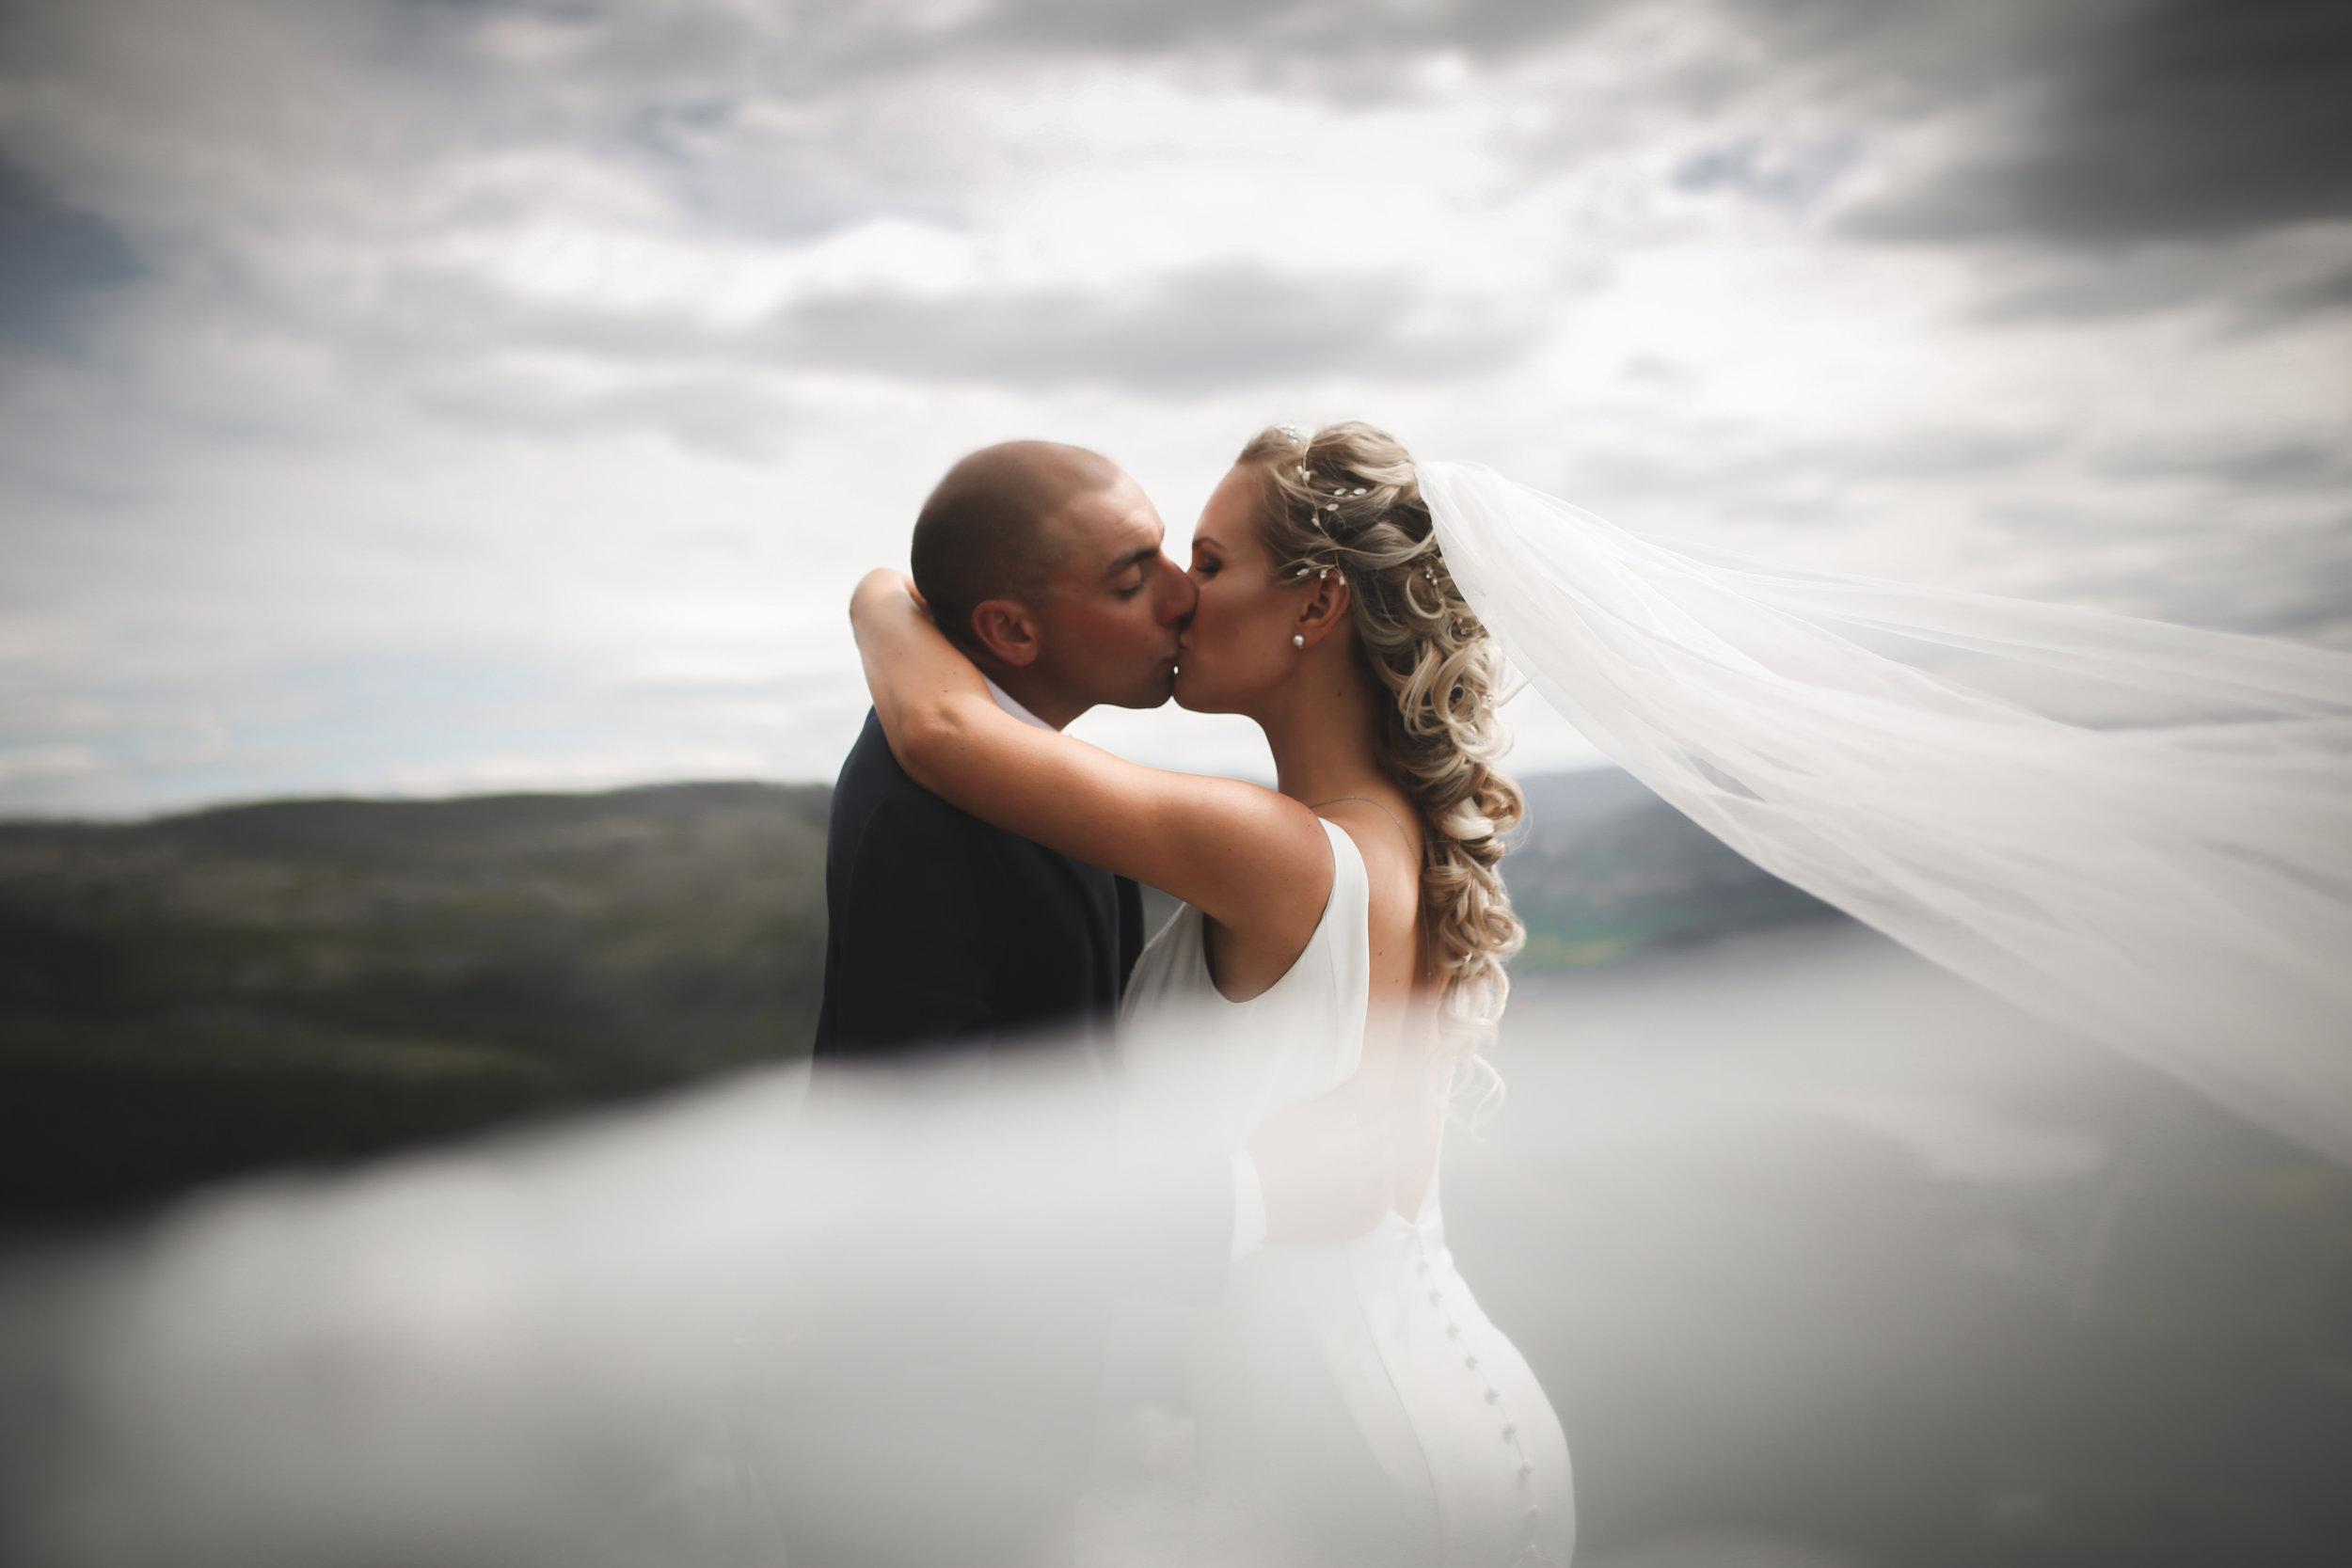 03 Adam Ziorio Photography - Kate & Ben's Wedding.jpg